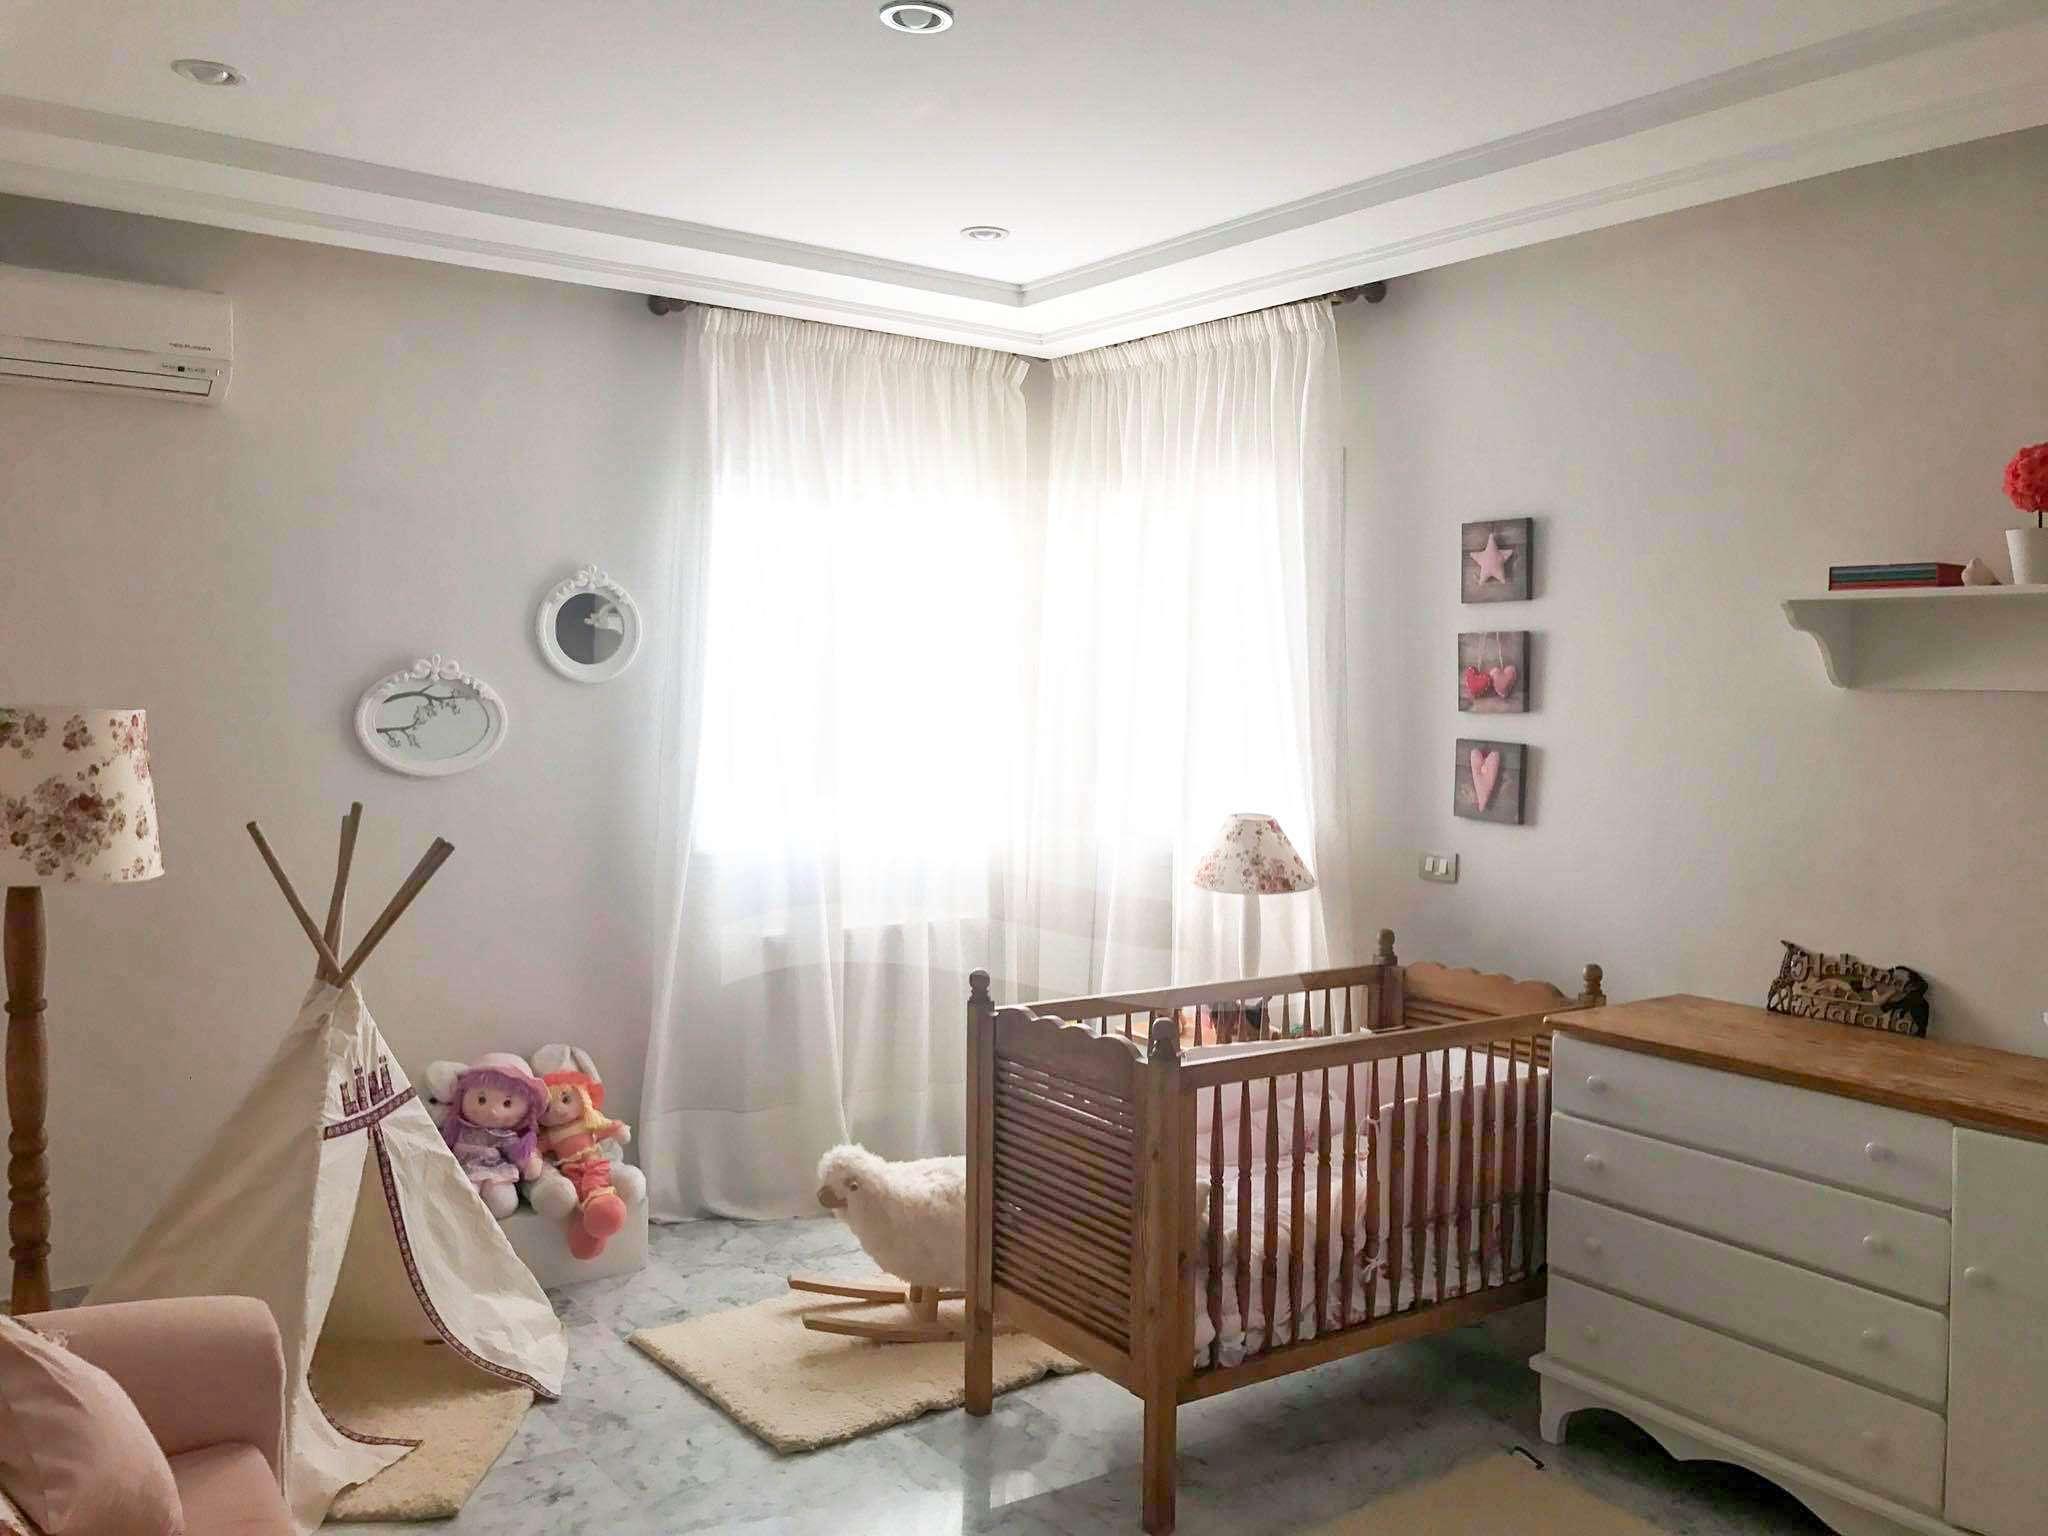 httpss3.amazonaws.comlogimoaws1424905801615200309appartement_jardin_de_carthage_1_sur_6-1